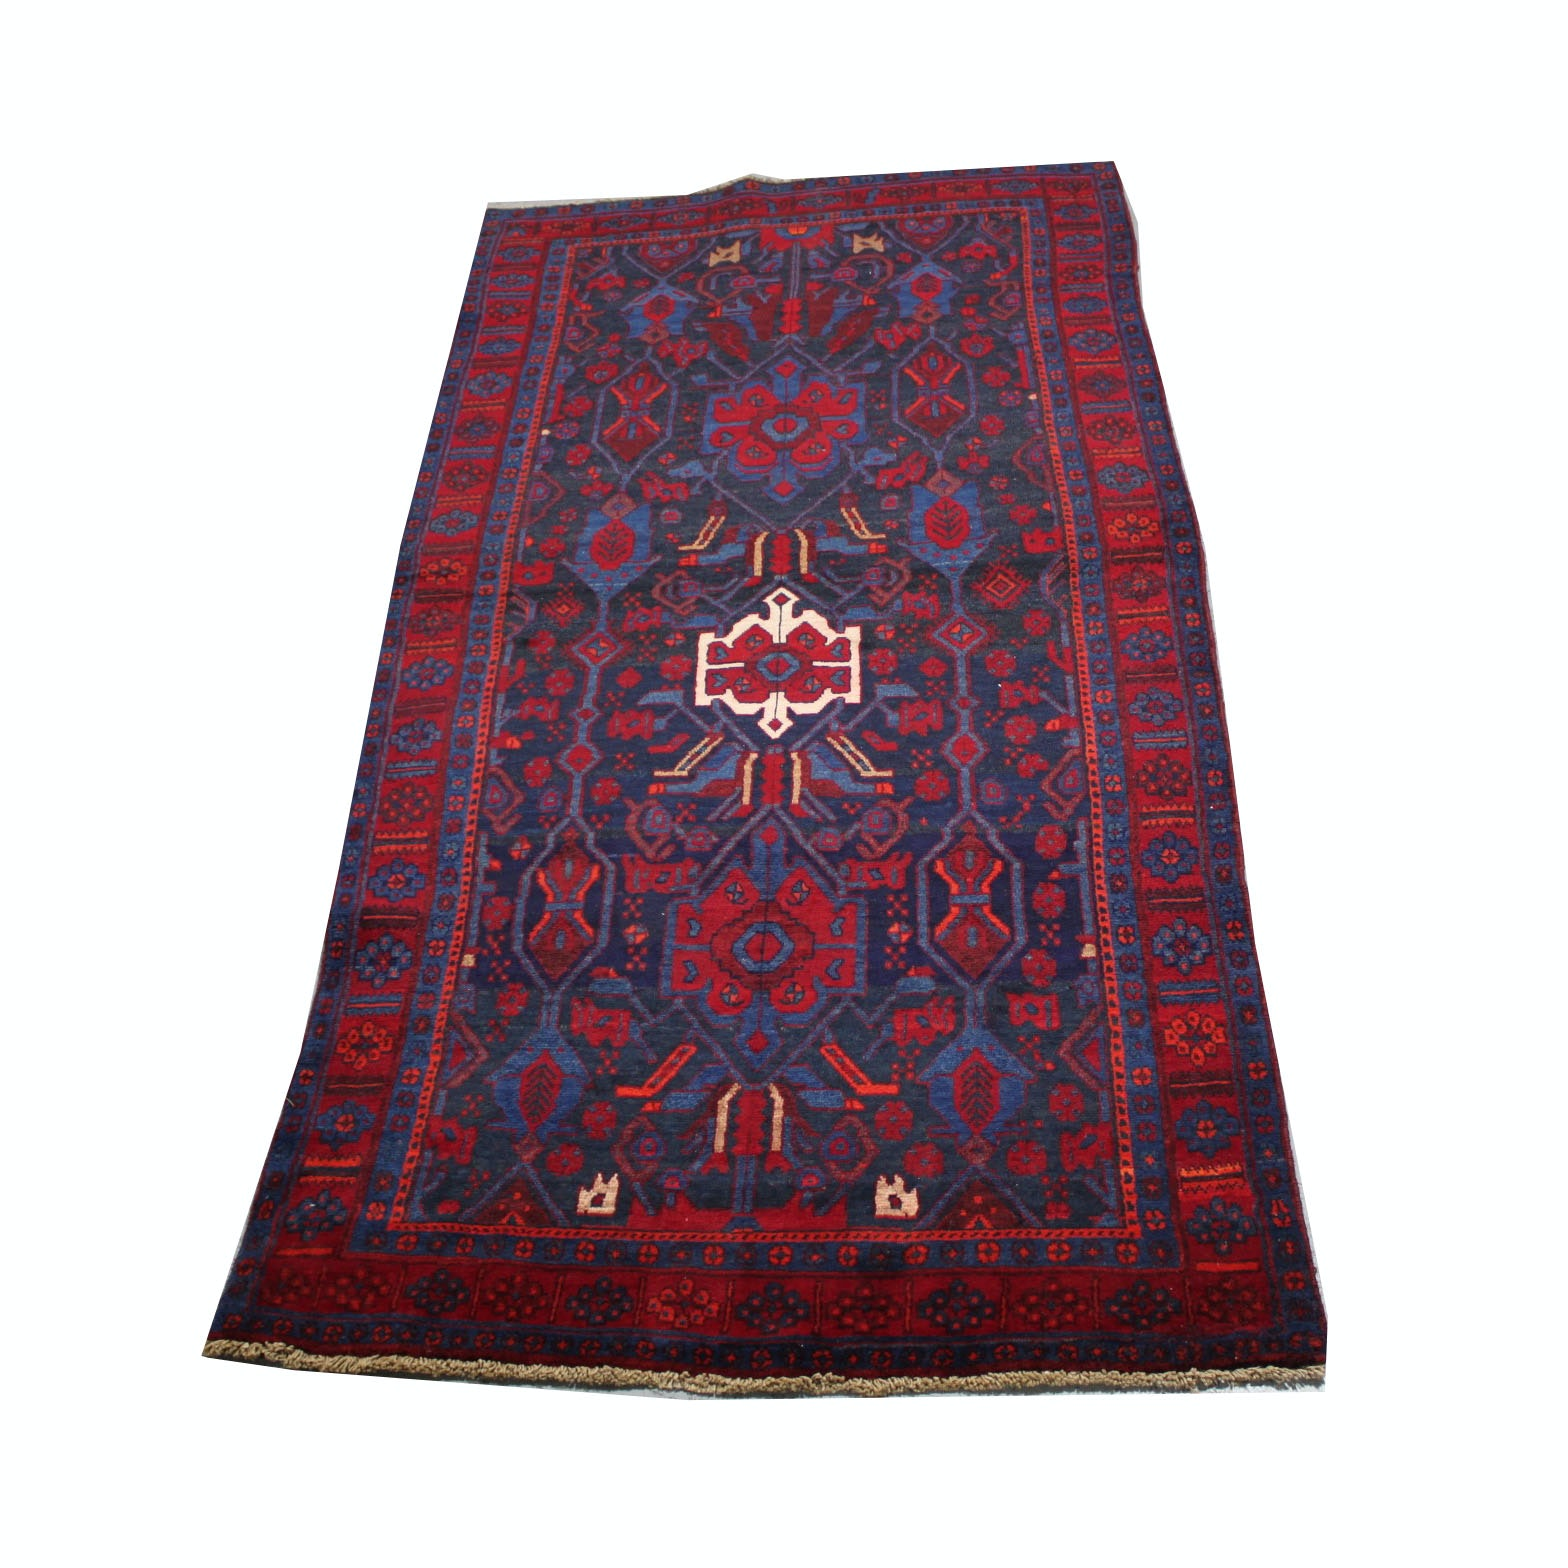 Vintage Hand-Knotted Persian Karaja Heriz Wool Accent Rug